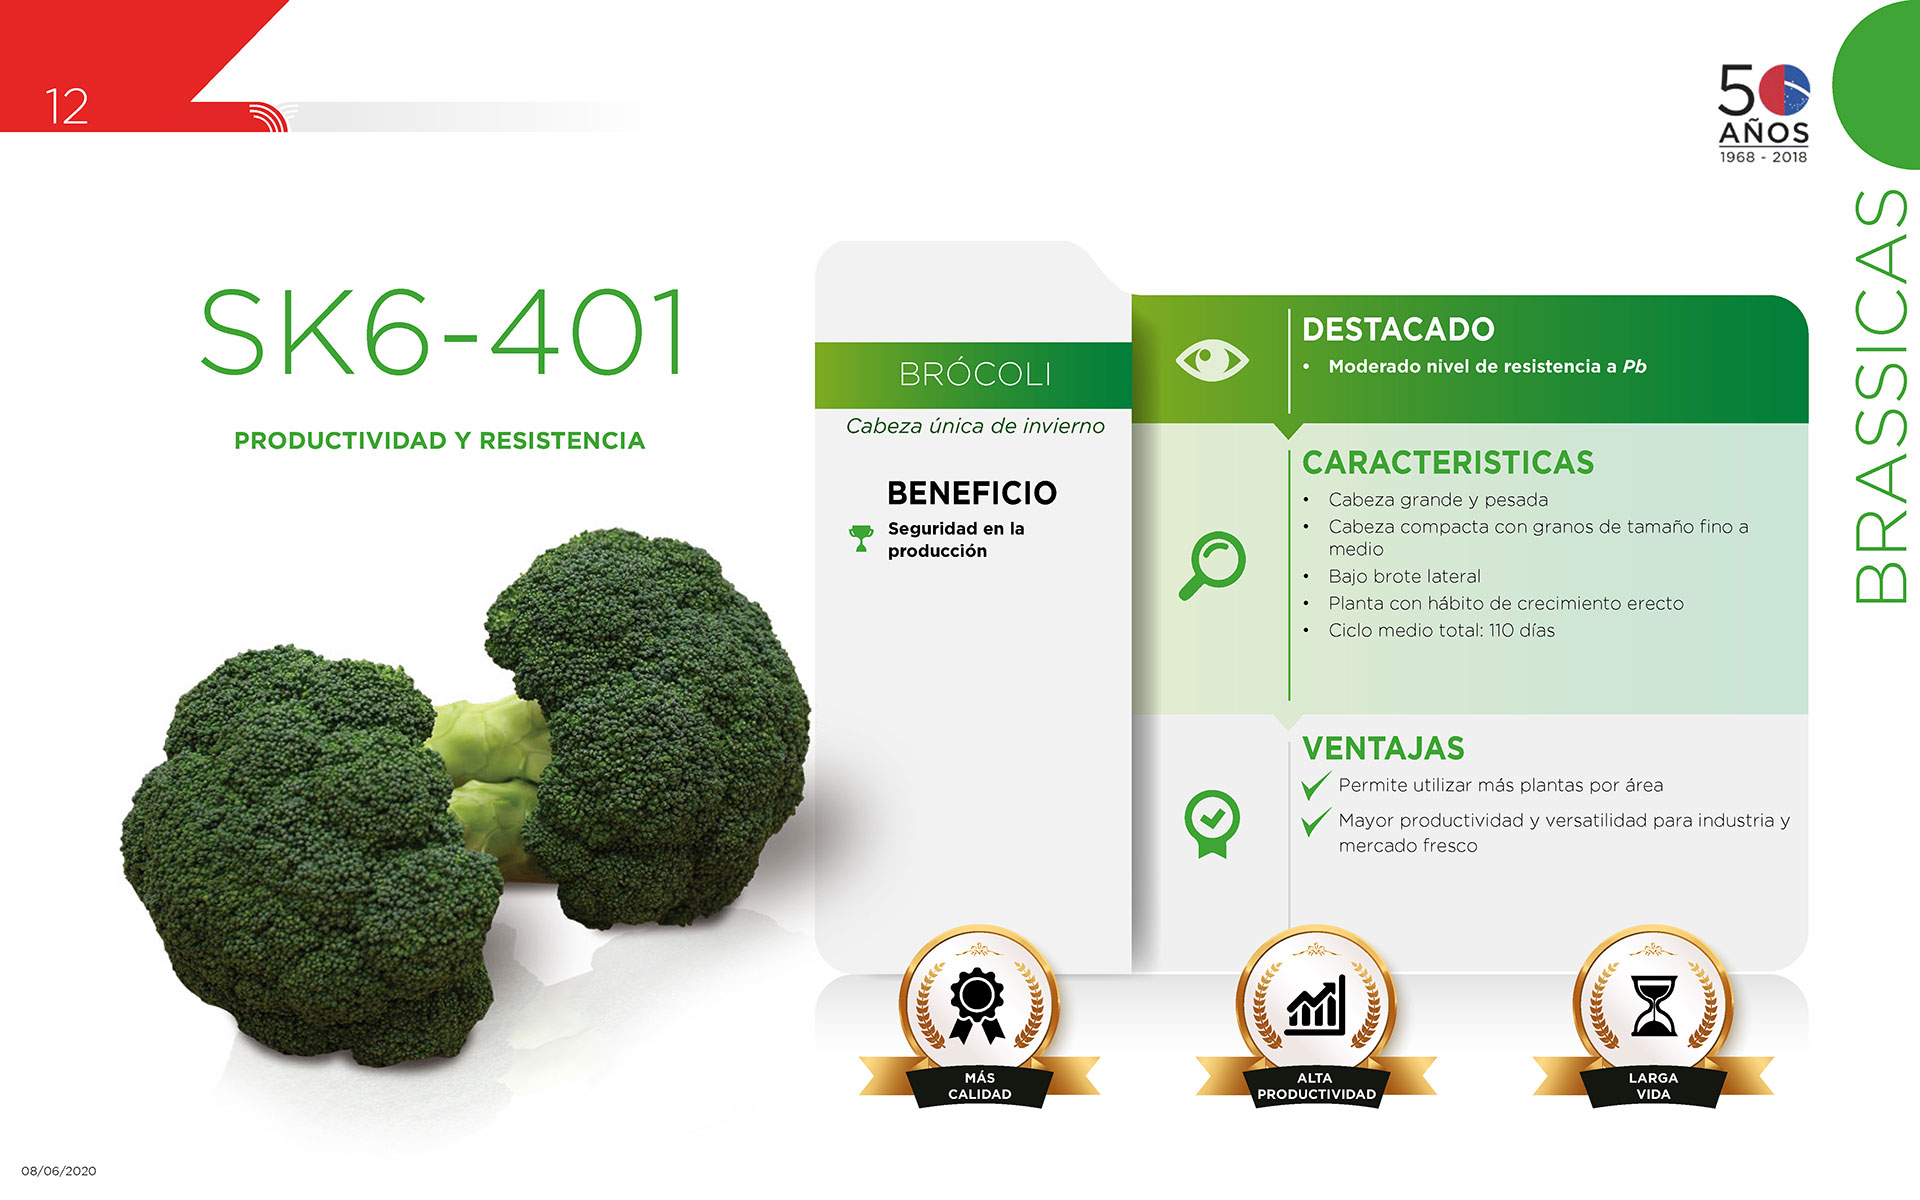 SK6-401 - Brassicas